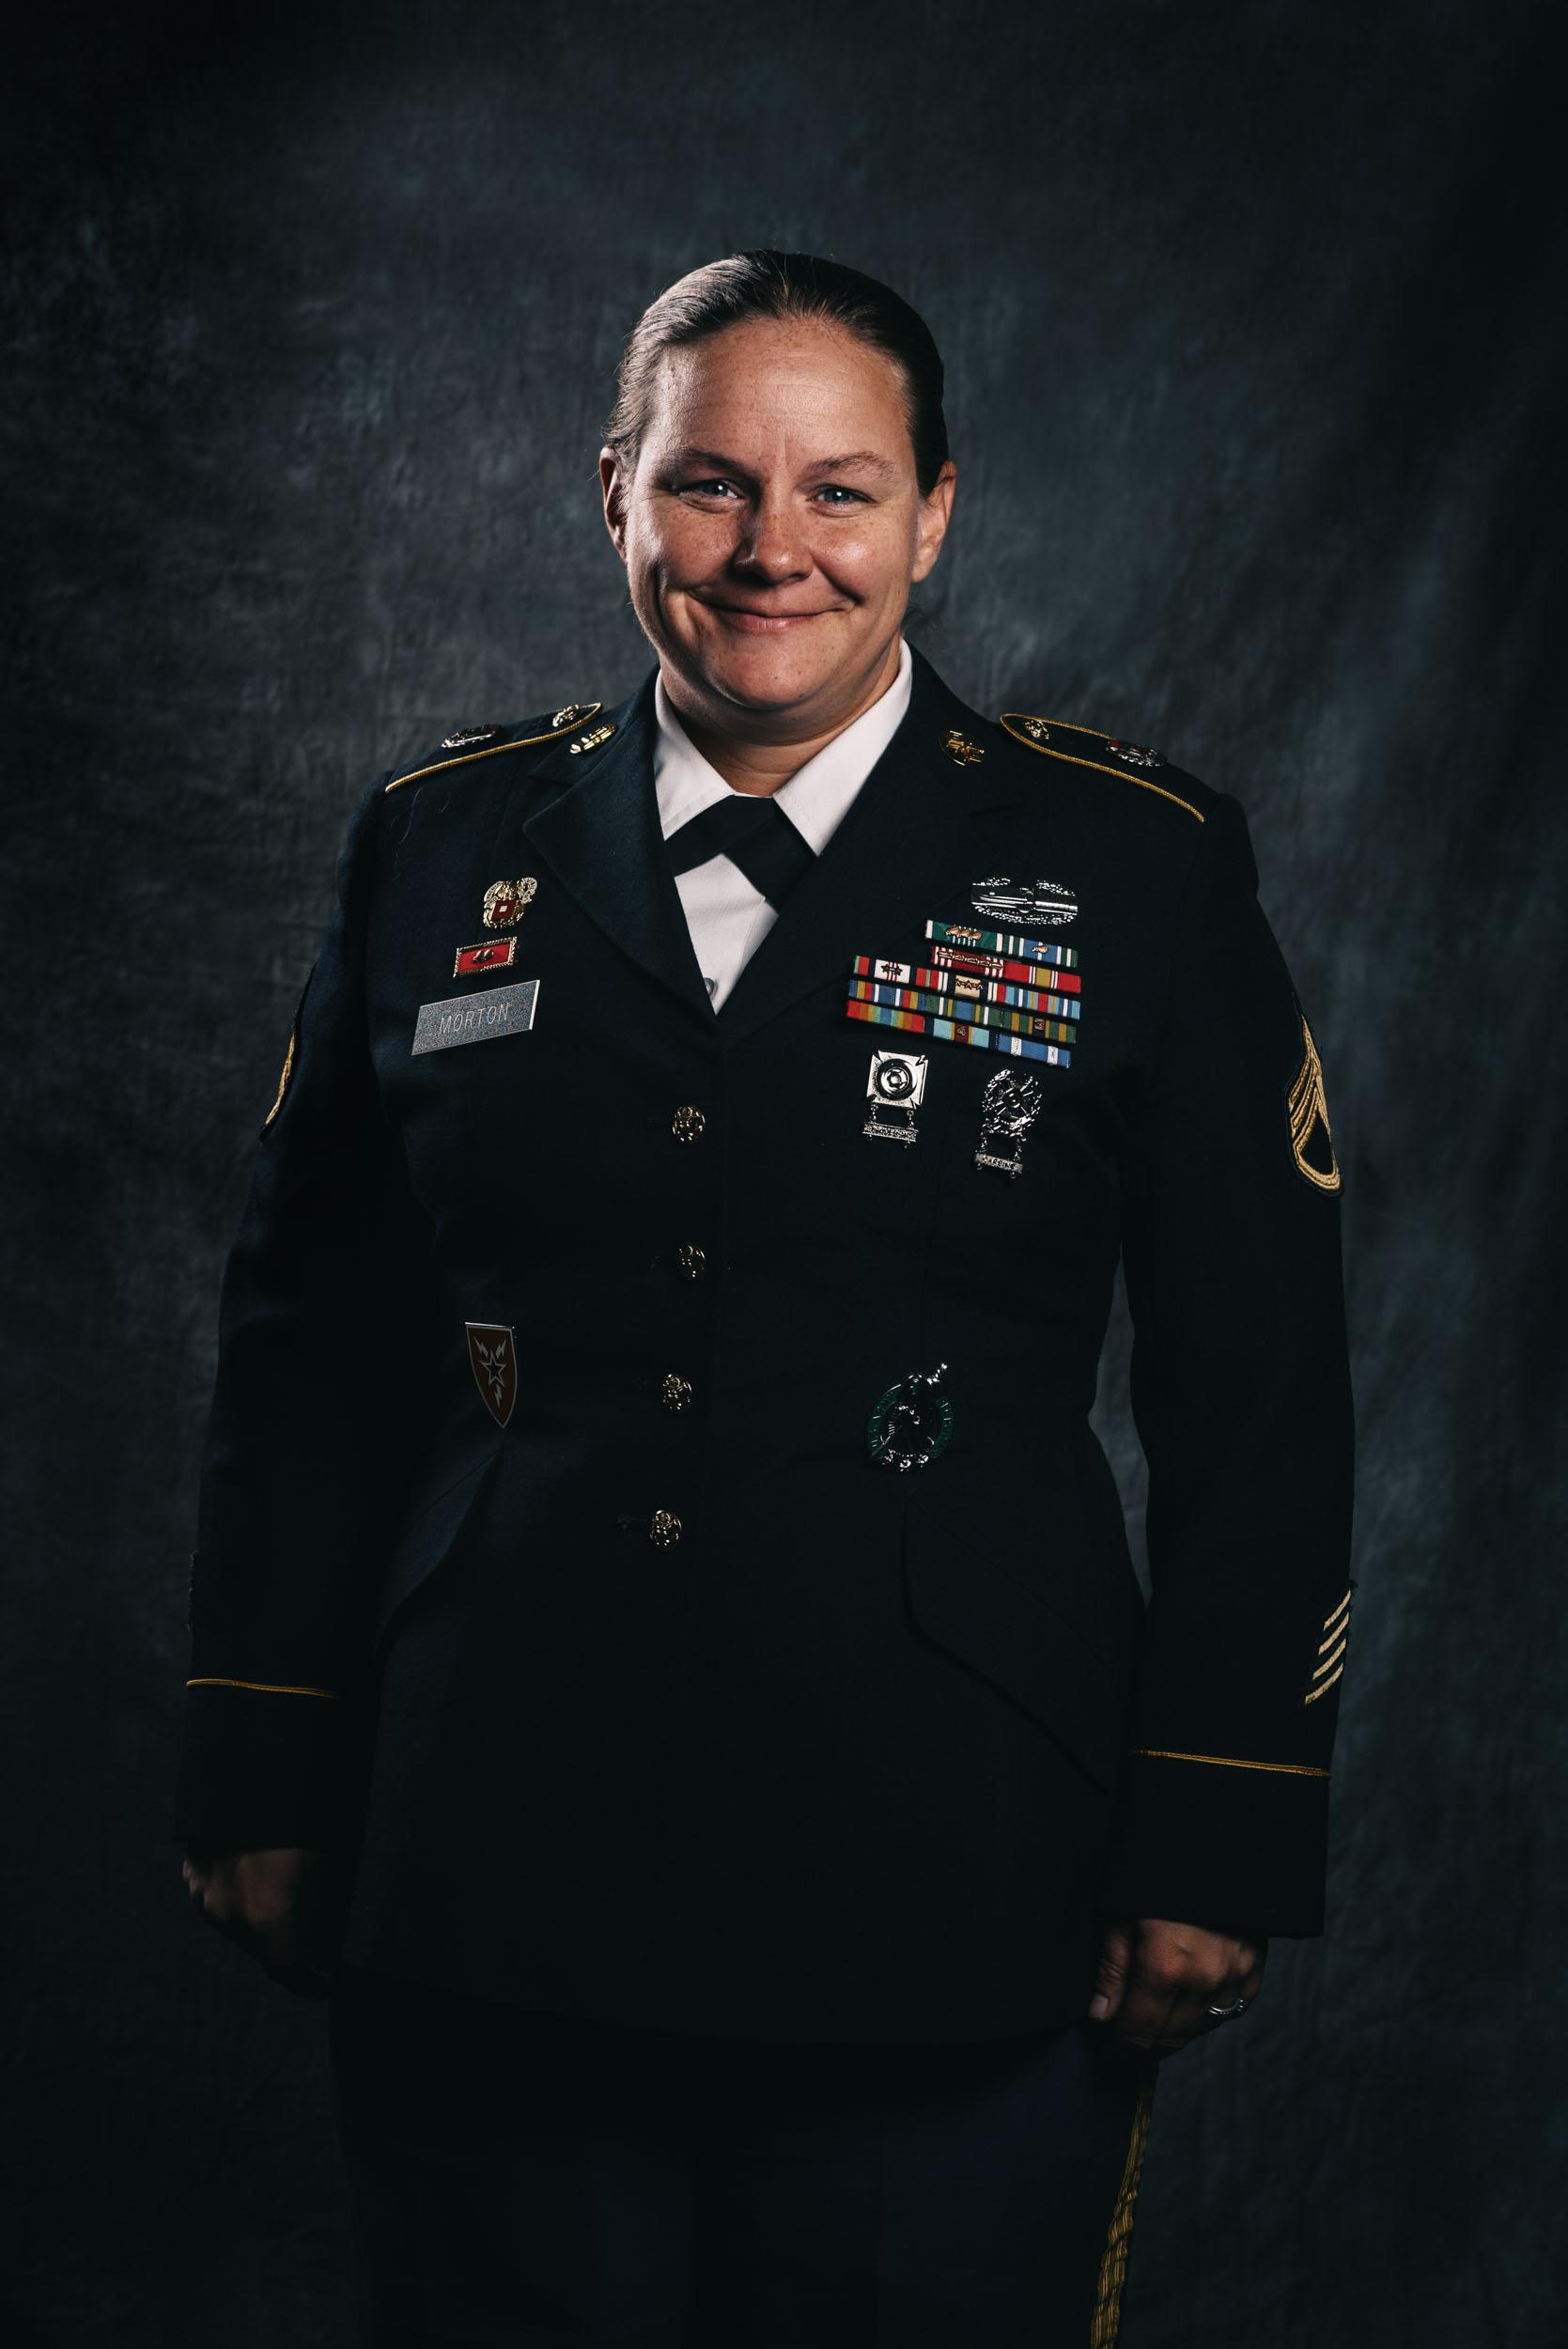 Staff Sergeant Patricia Morton